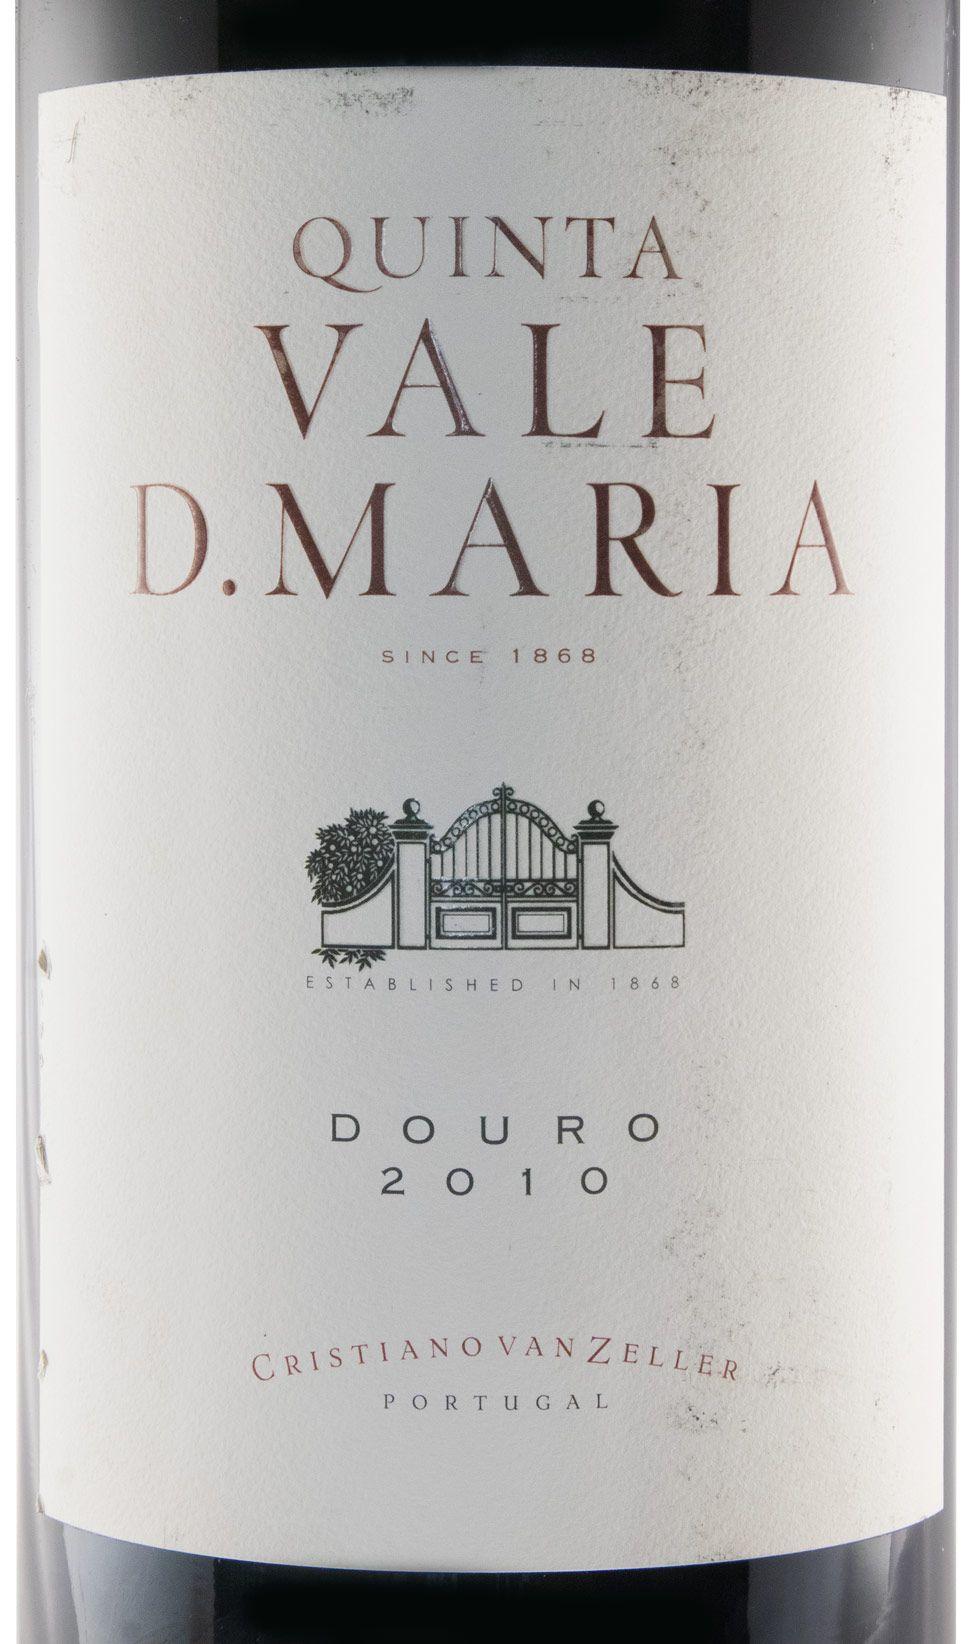 2010 Quinta Vale Dona Maria tinto 5L